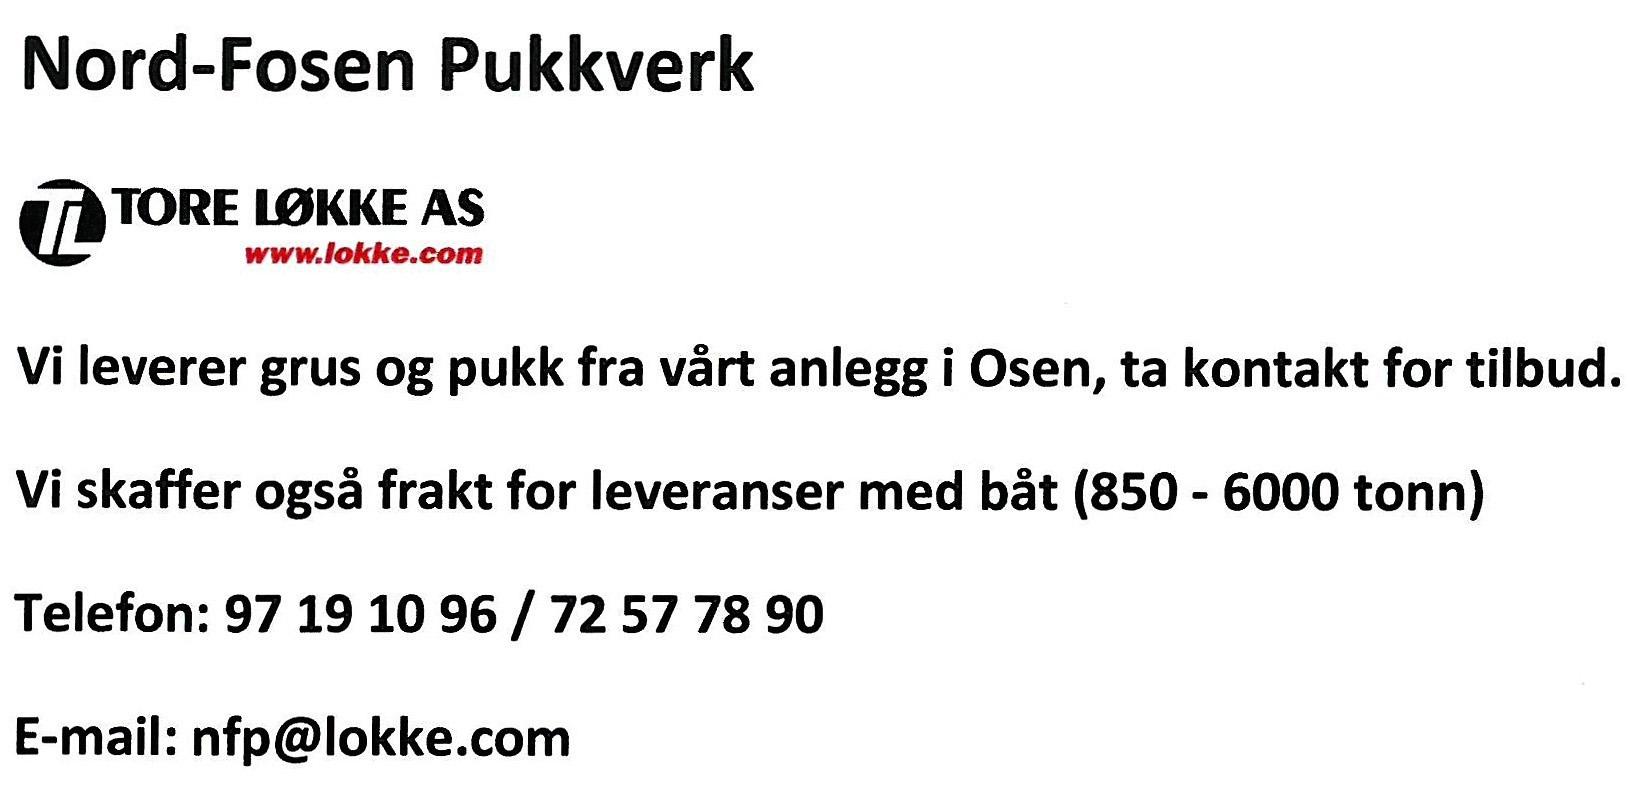 Nord-Fosen Pukkverk - Tore Løkke A/S